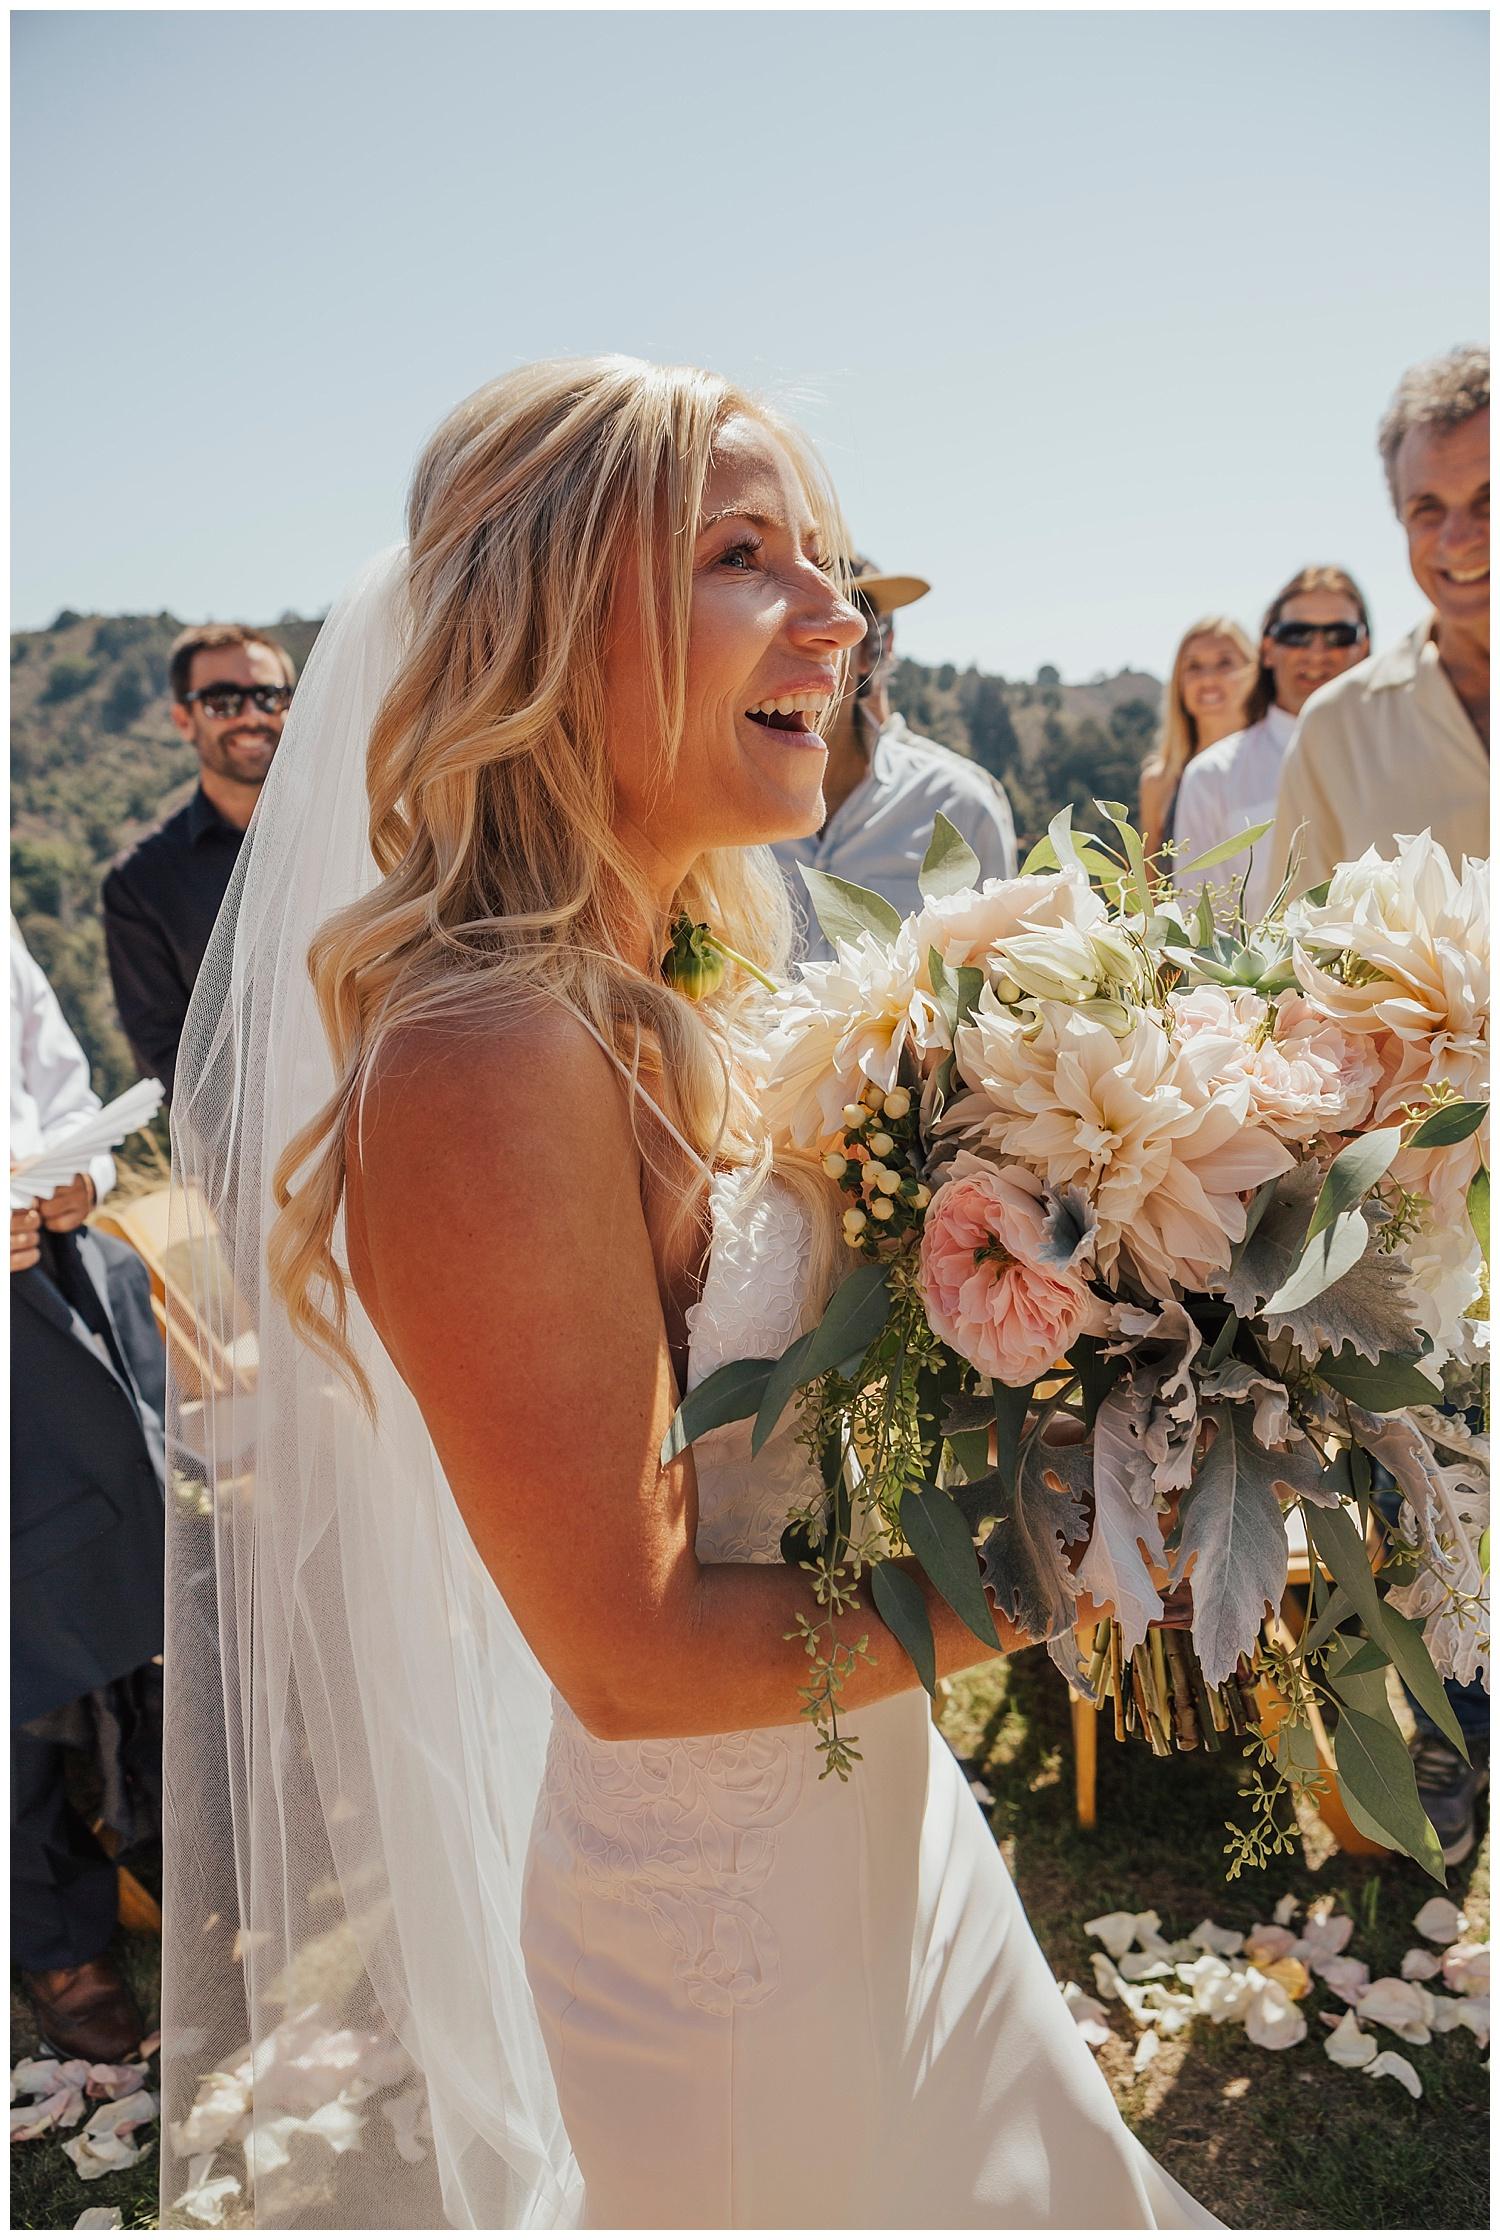 big-sur-wedding-summer-bride-carol-oliva-photograhy.jpg